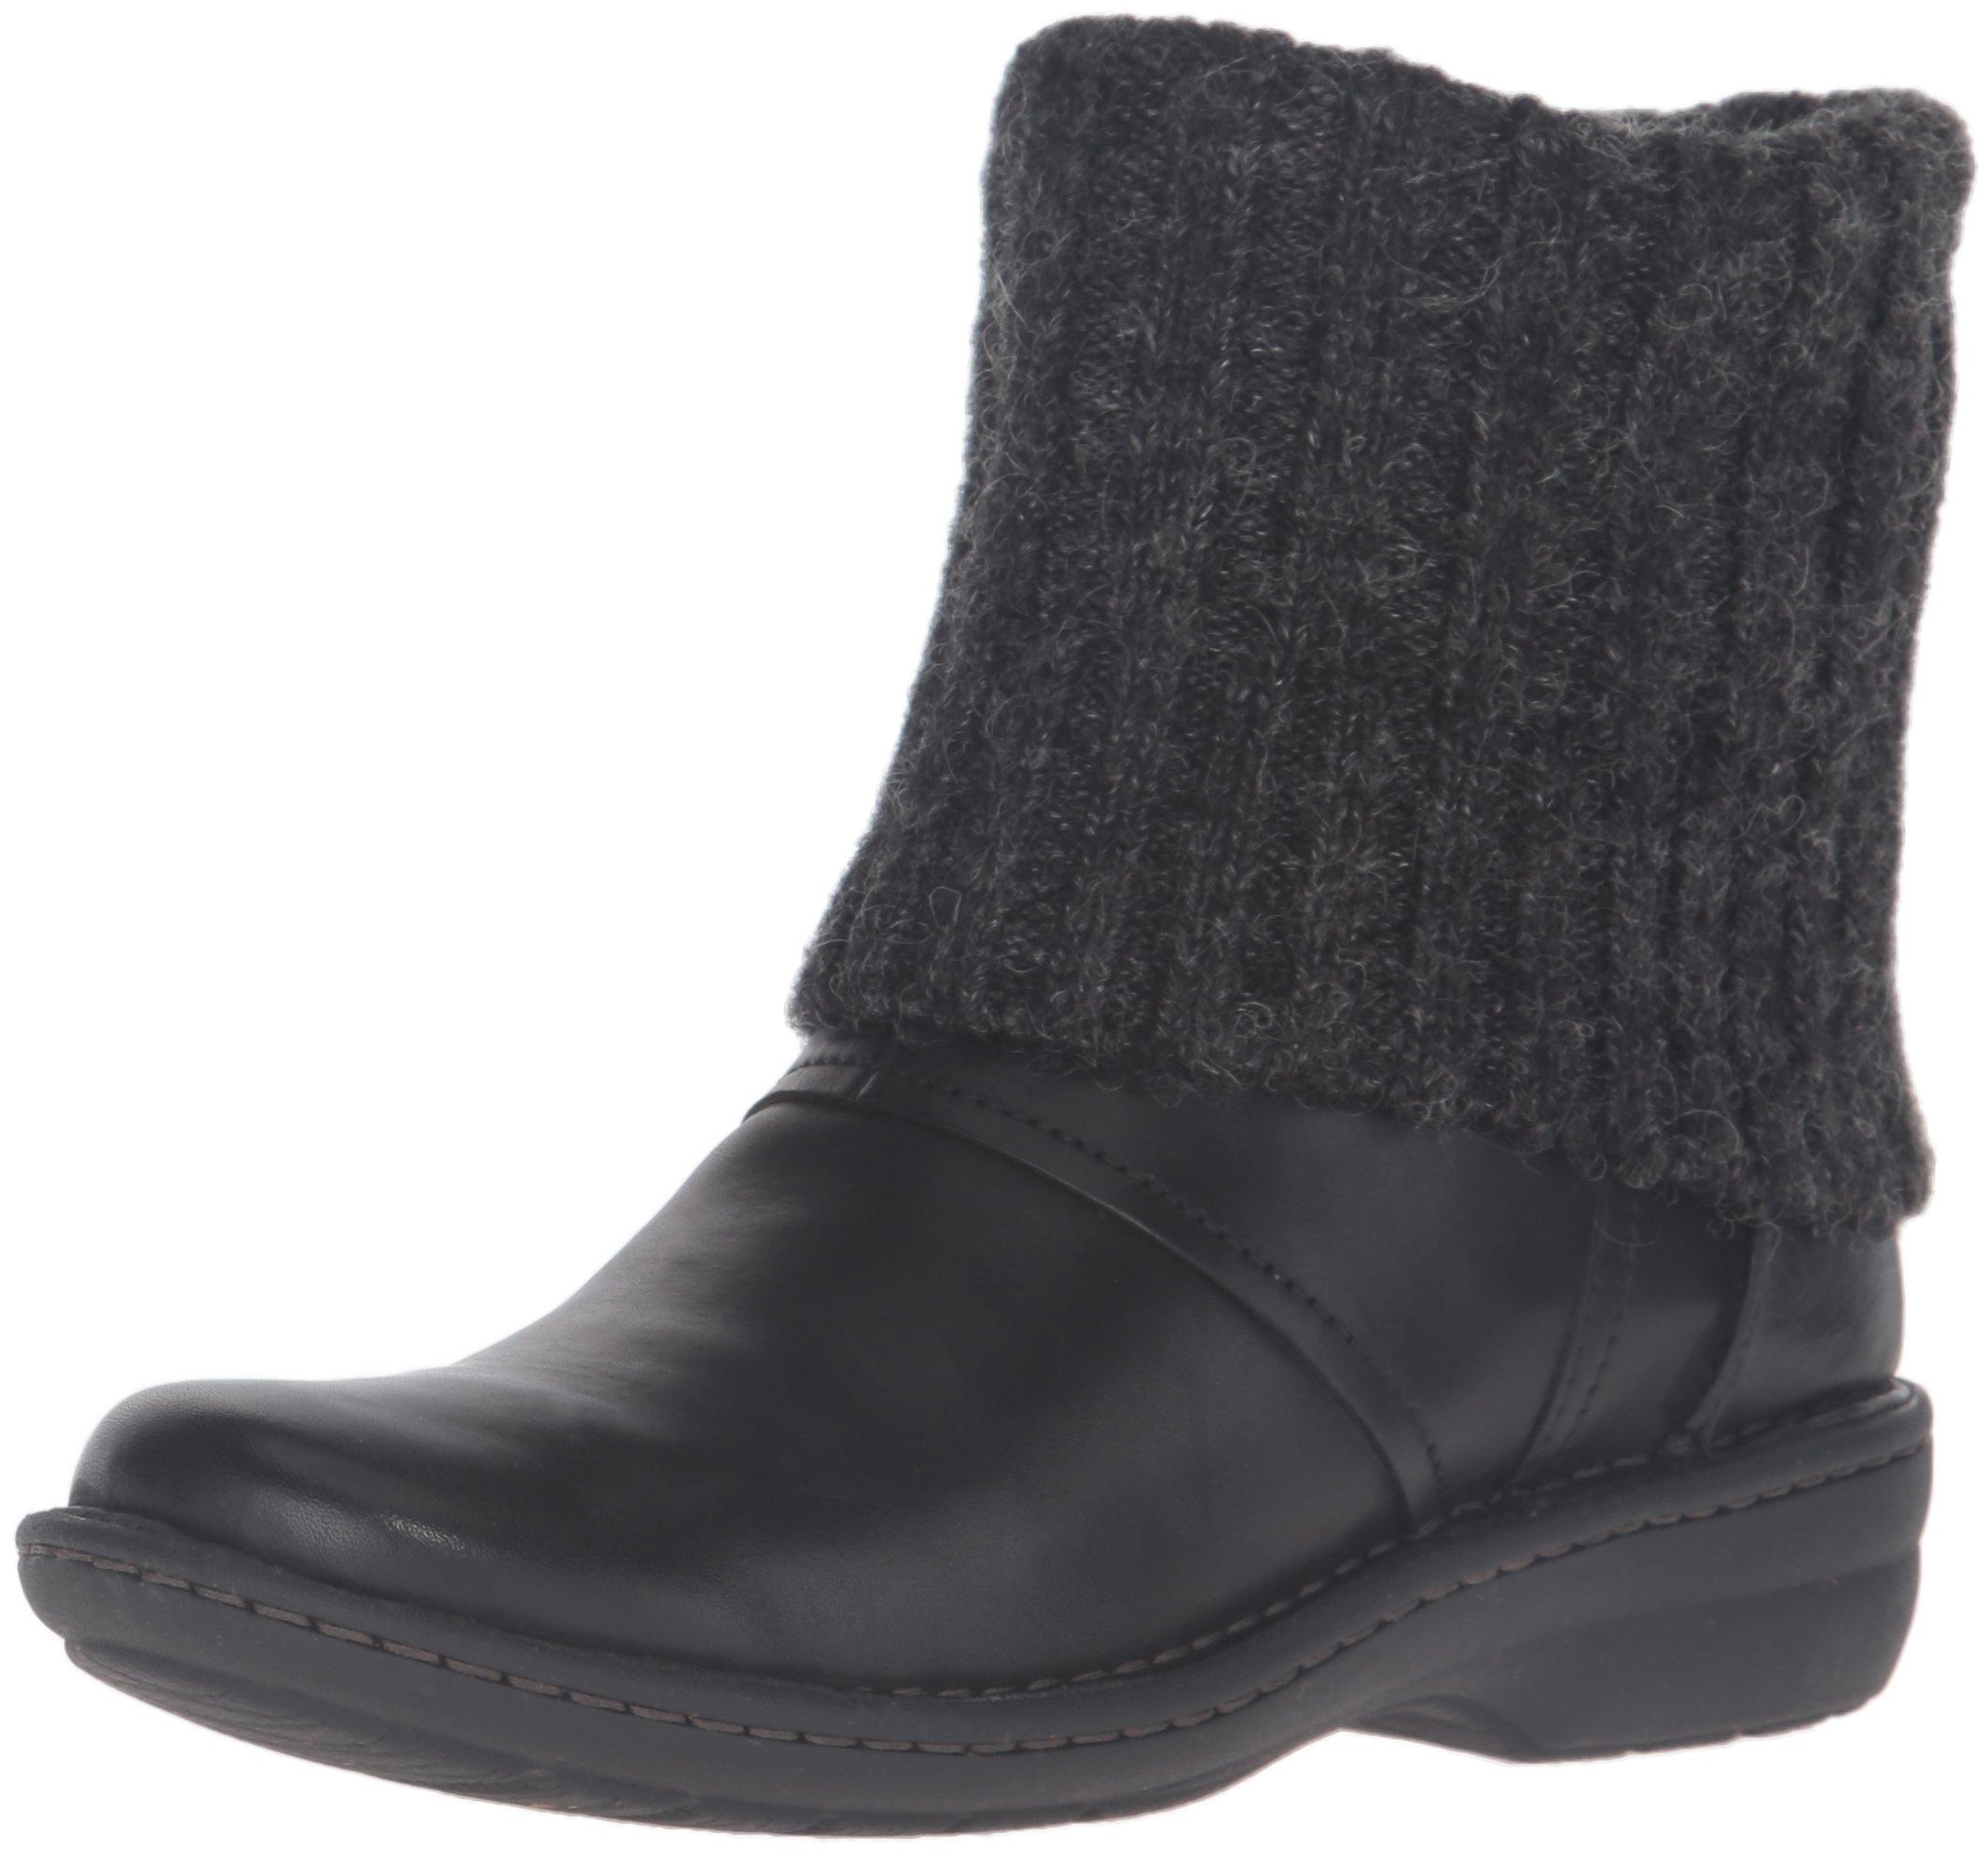 Clarks Women's Avington Style Boot, Black Leather, 6 M US by CLARKS